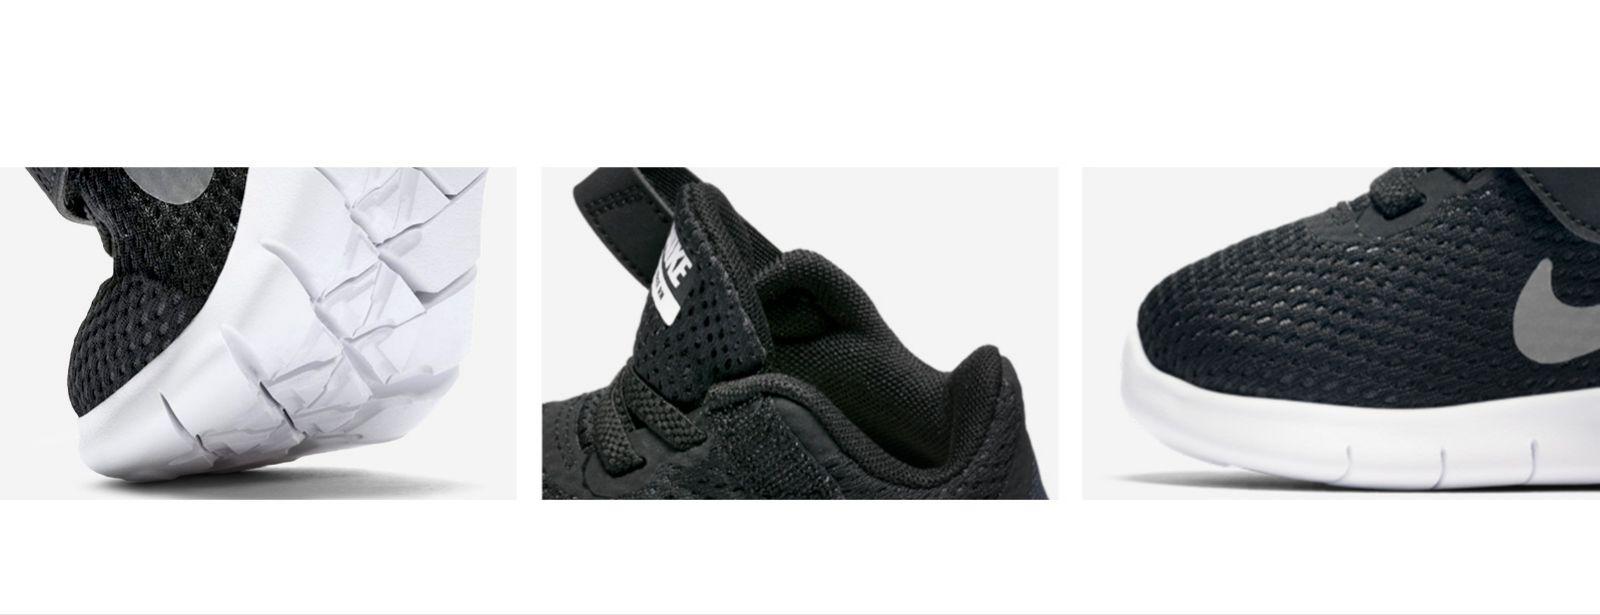 baby nike shoes nike_kids_baby_toddler_shoe_innovation.jpg ZHPIPJK